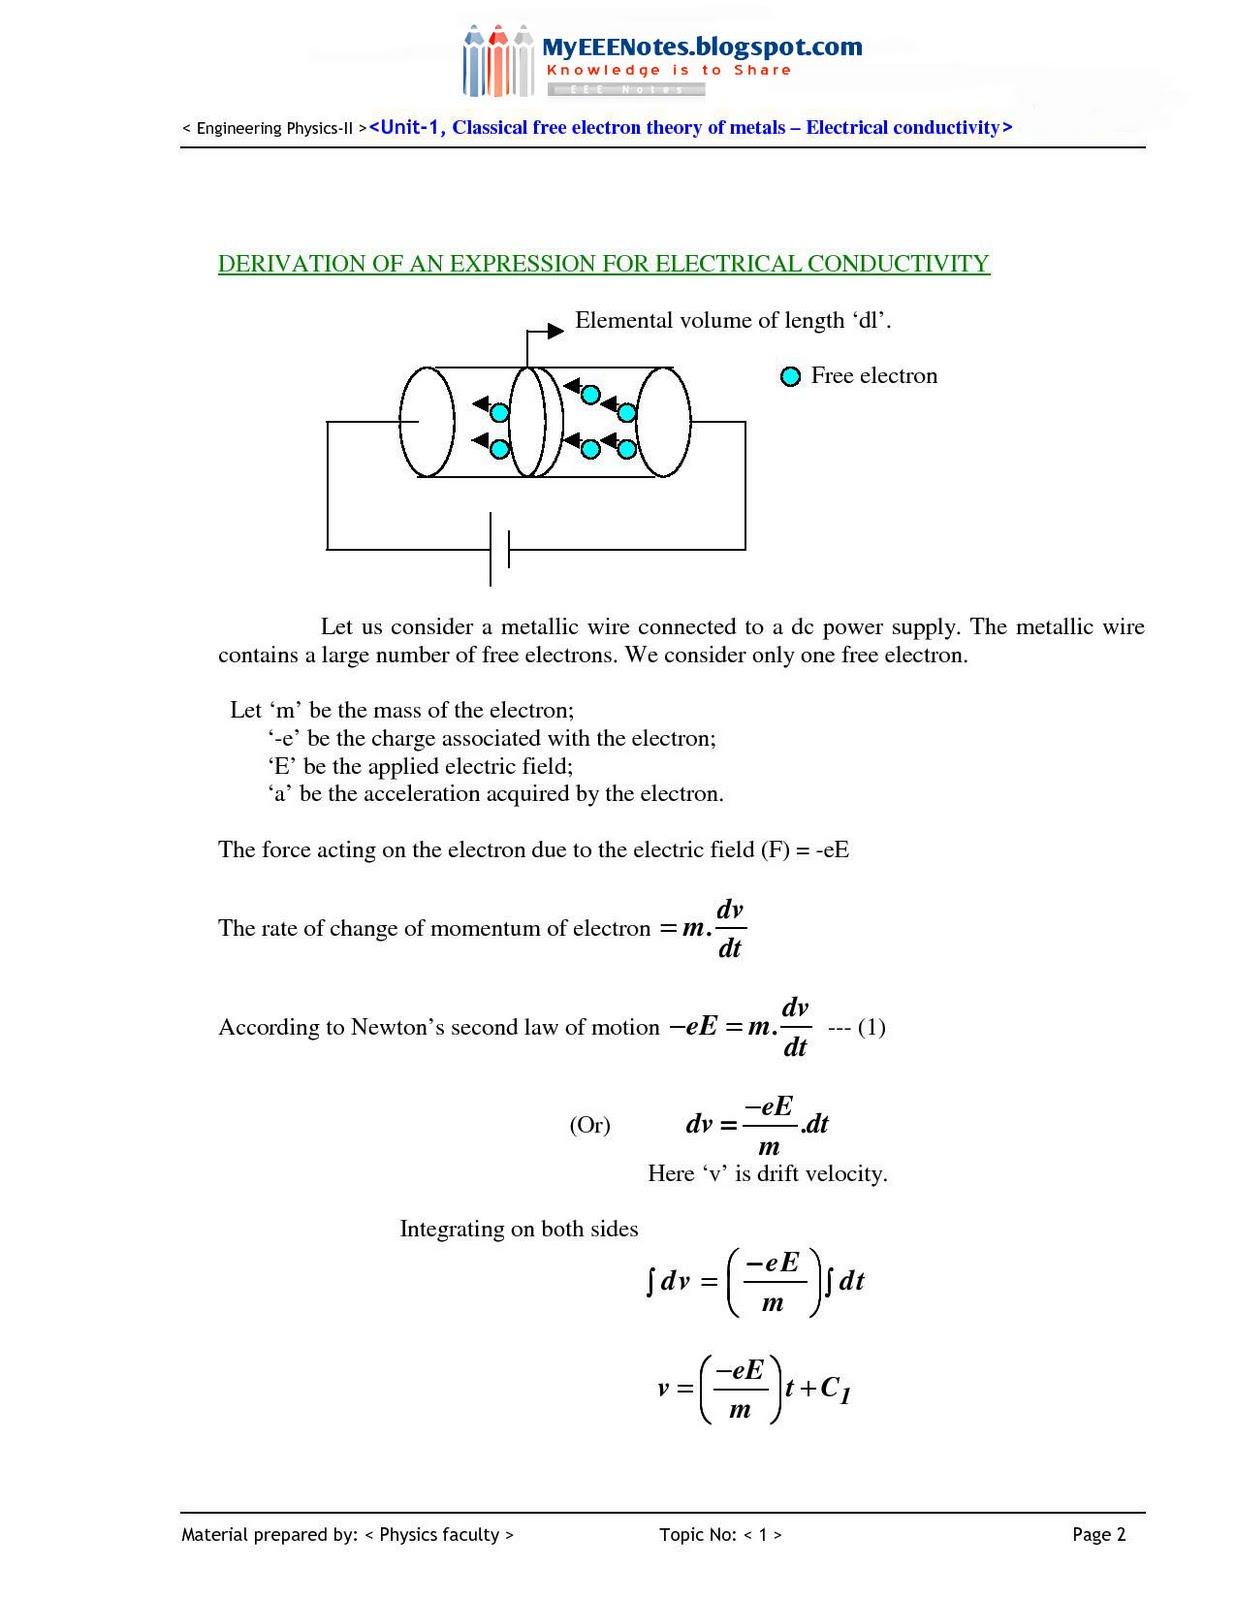 Physics conductivity in metals